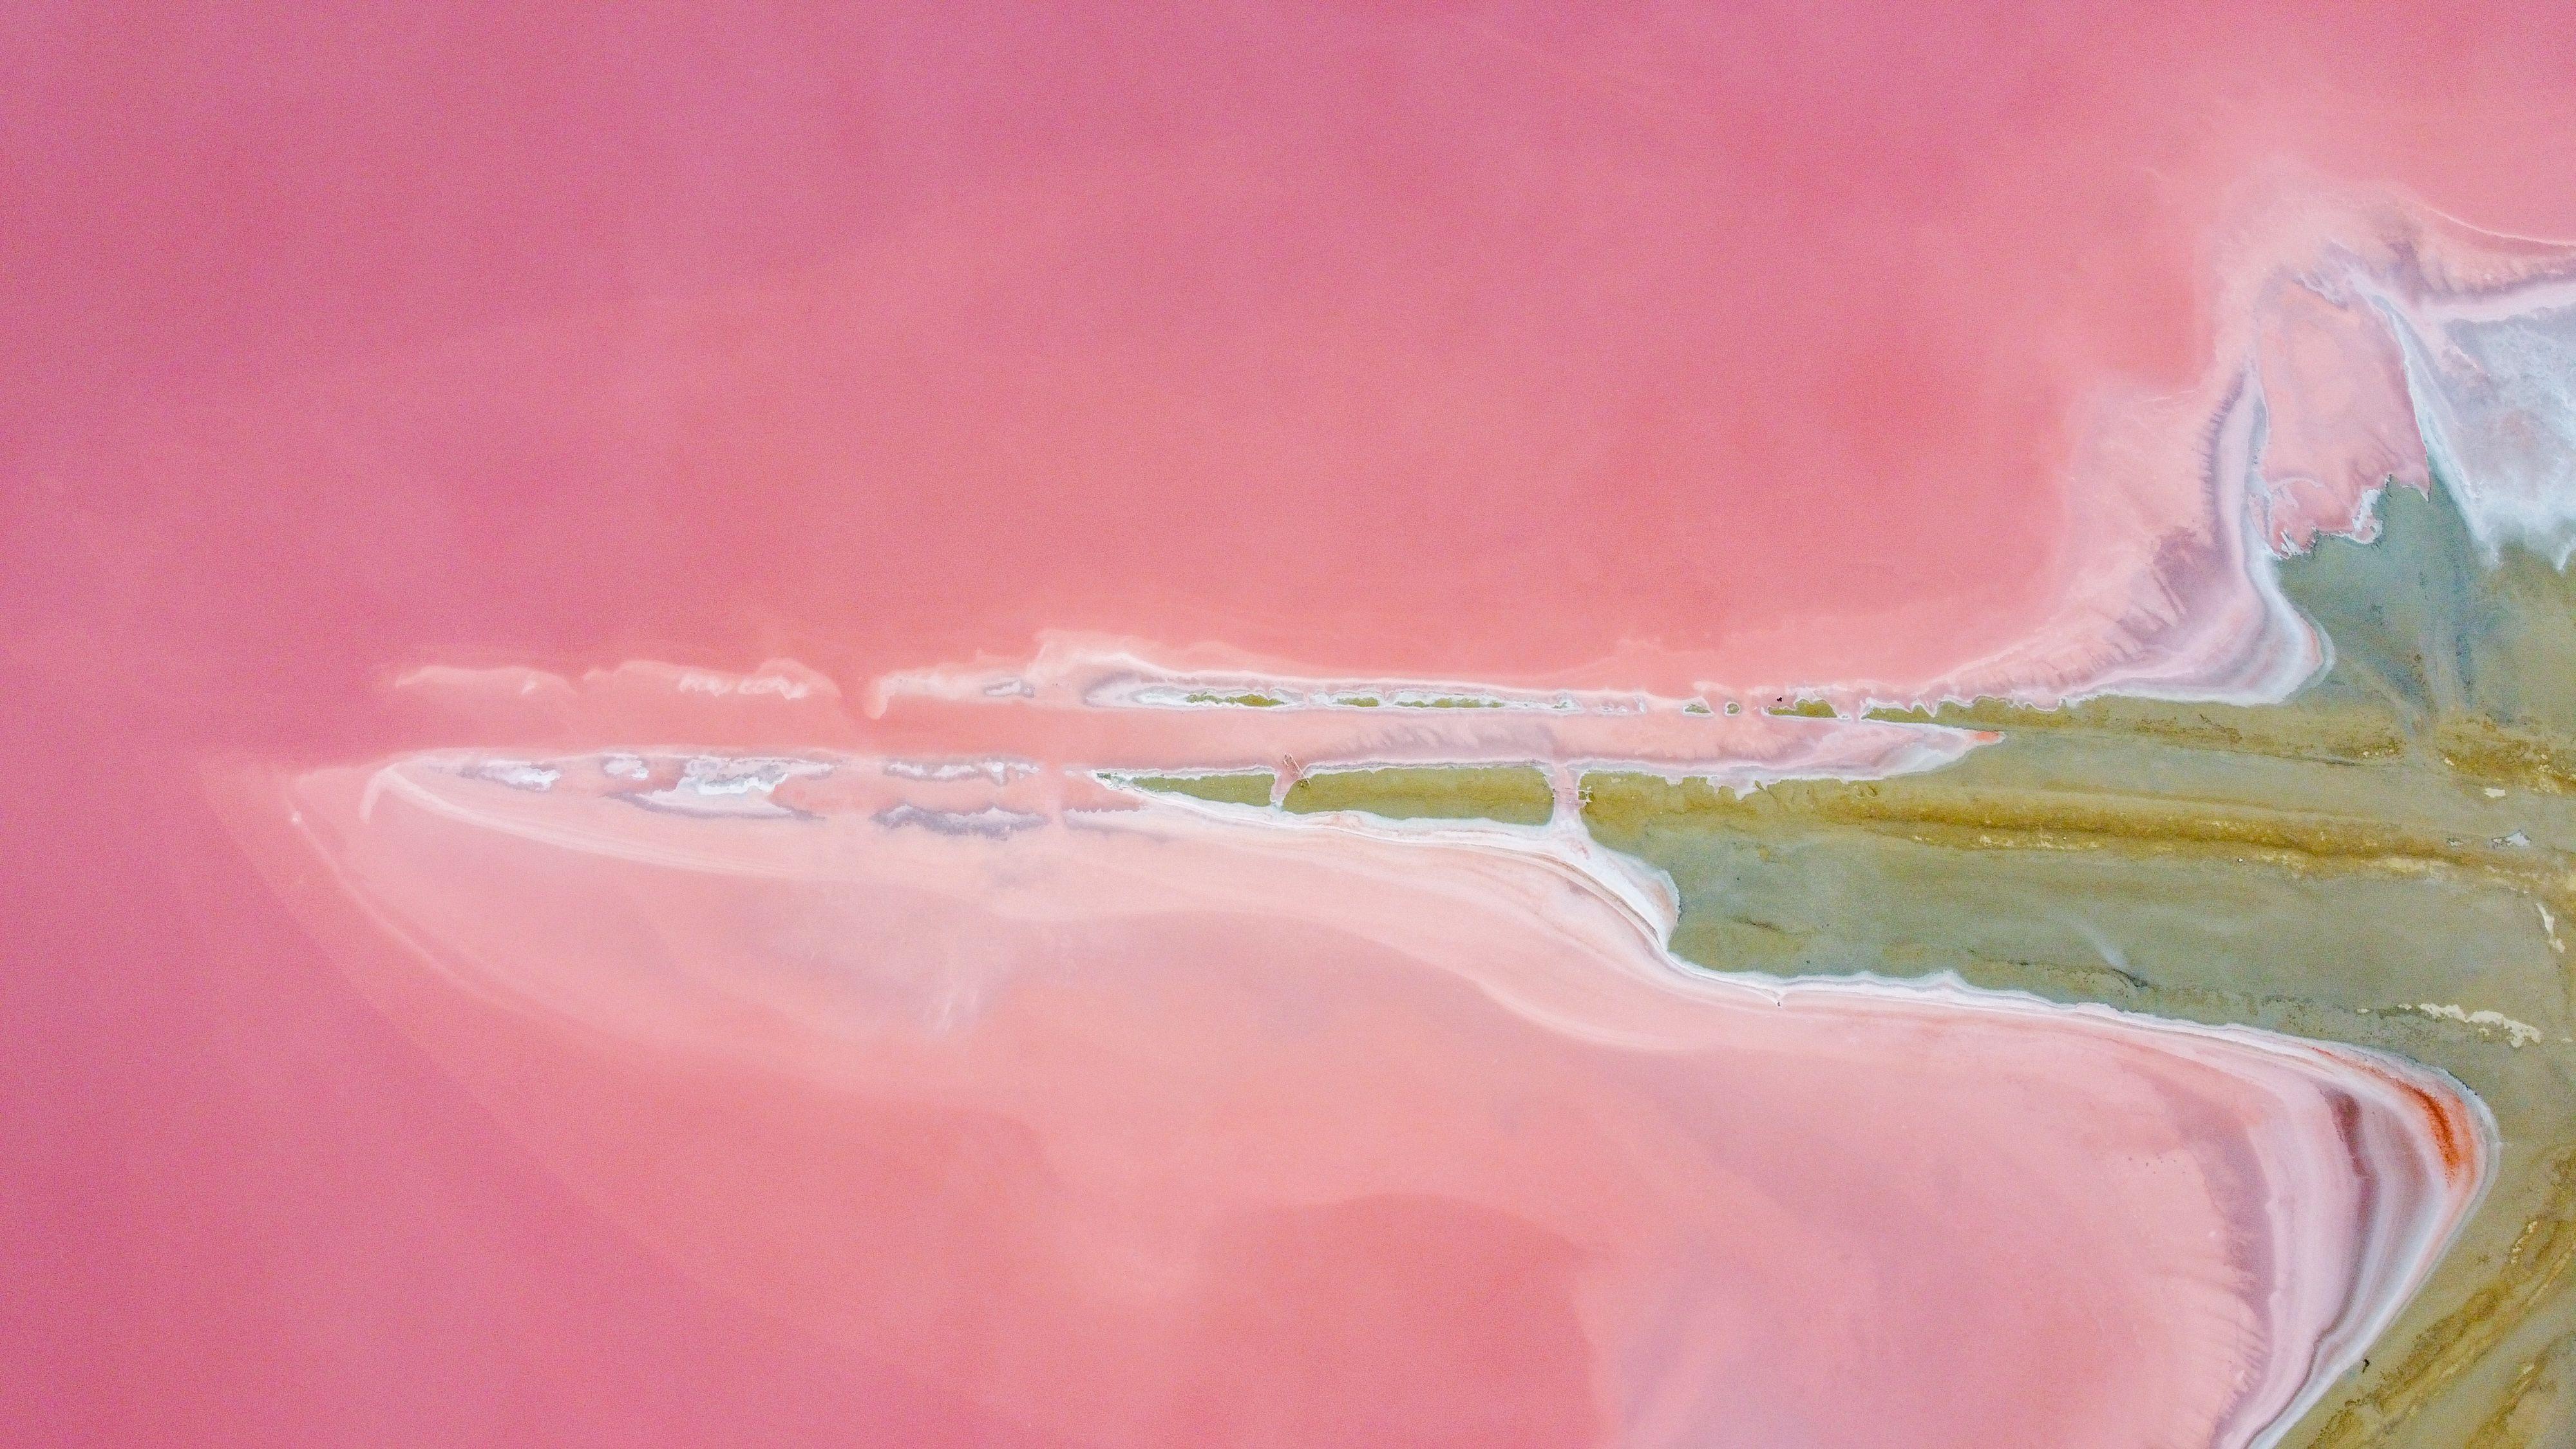 Bogeria de paisatge Salines Aigues Mortes#Alba Gimeno 312